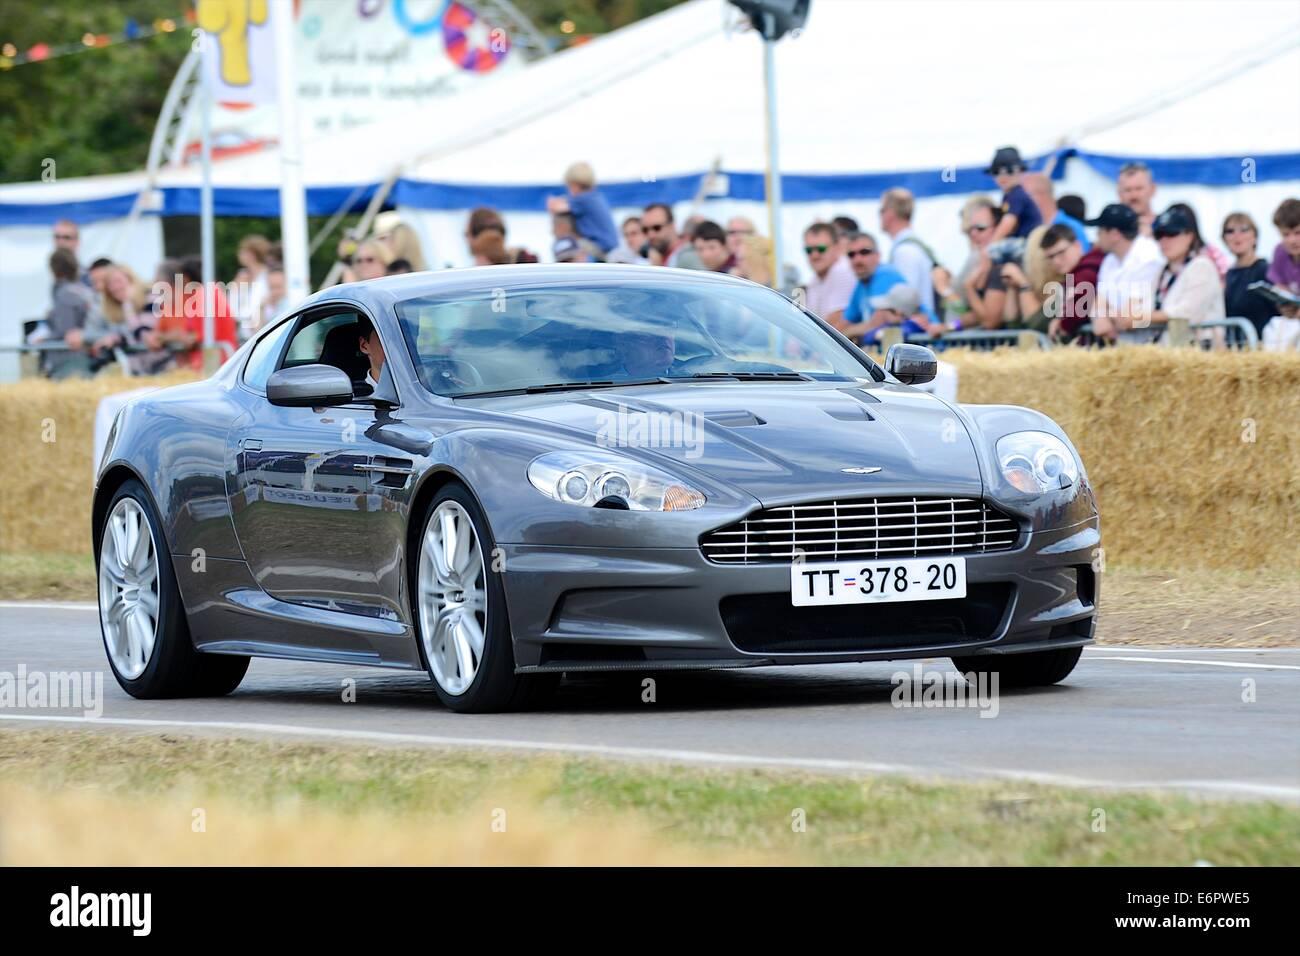 James Bond S Aston Martin Dbs From Casino Royale At Chris